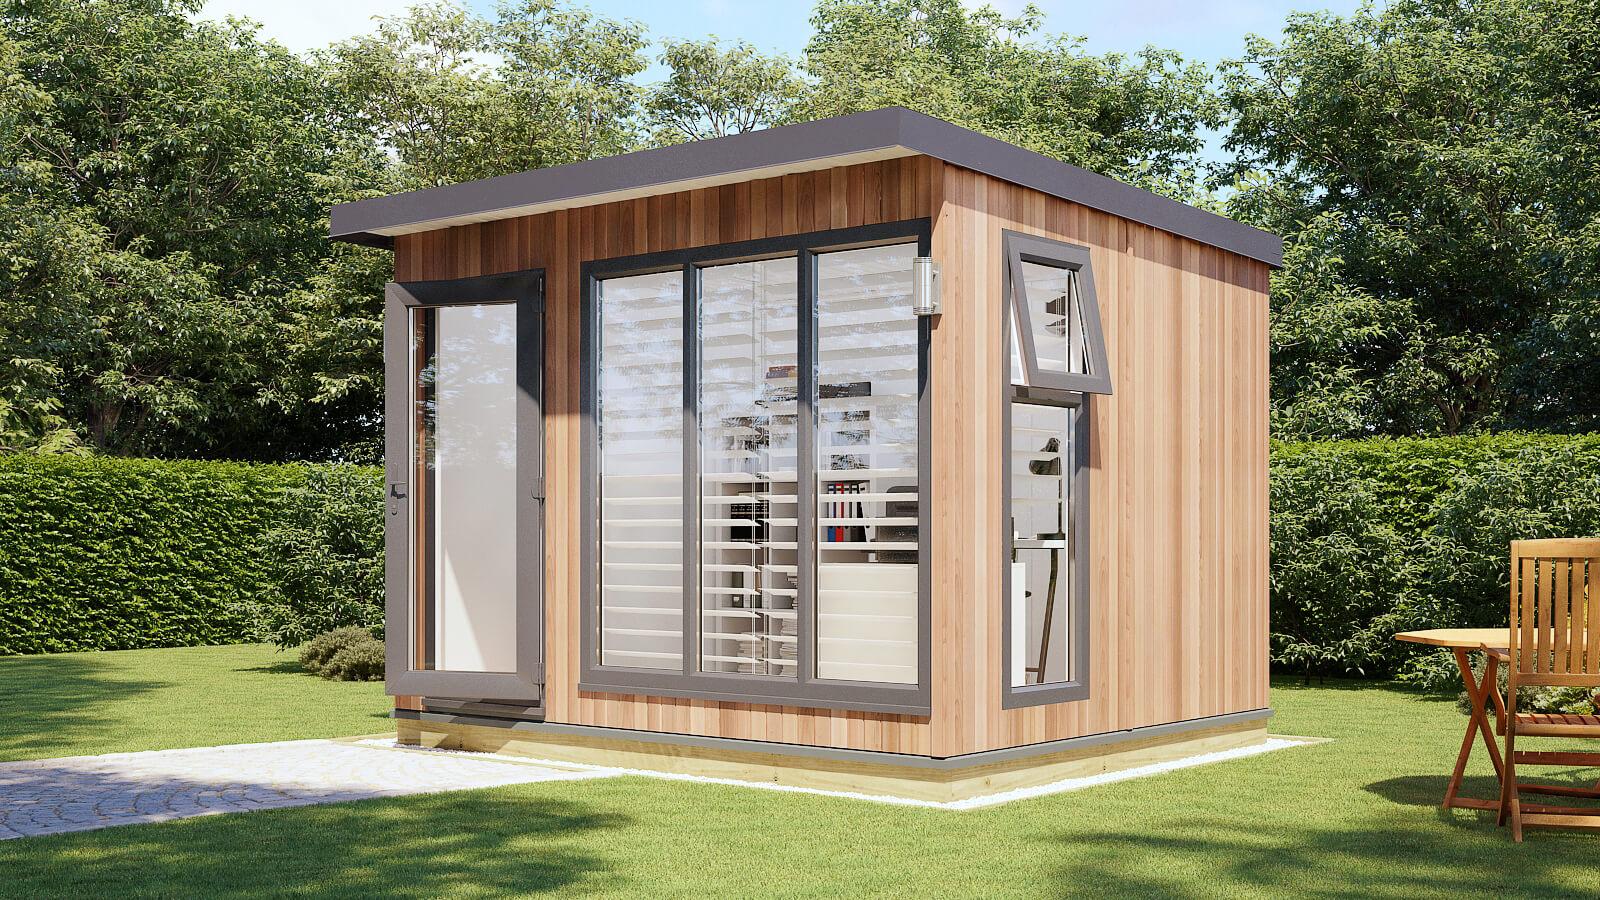 Evolution Insulated Garden Office